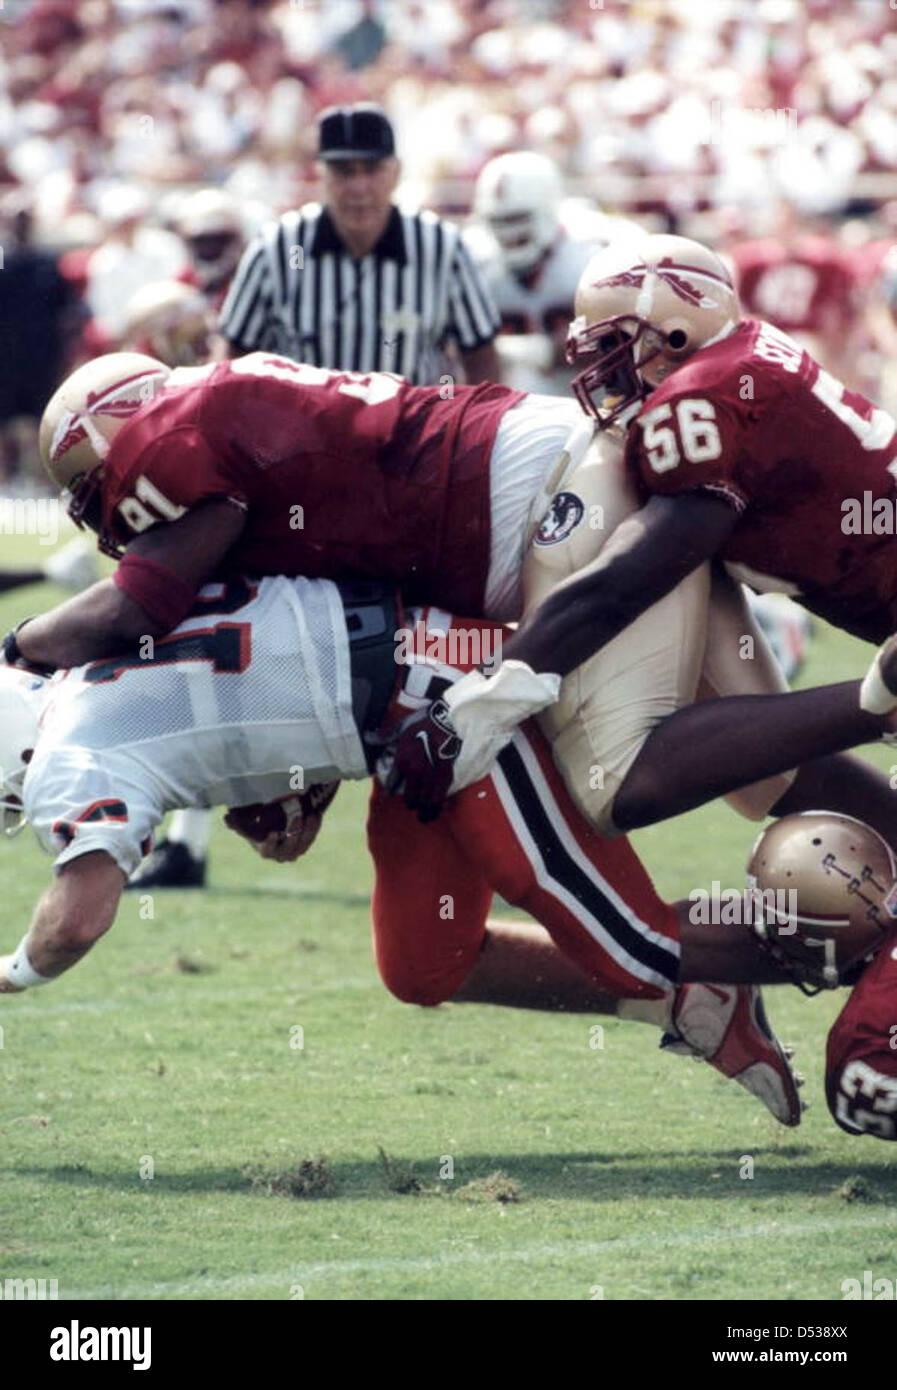 Florida State University versus the University of Miami at Doak Campbell Stadium: Tallahassee, Florida - Stock Image